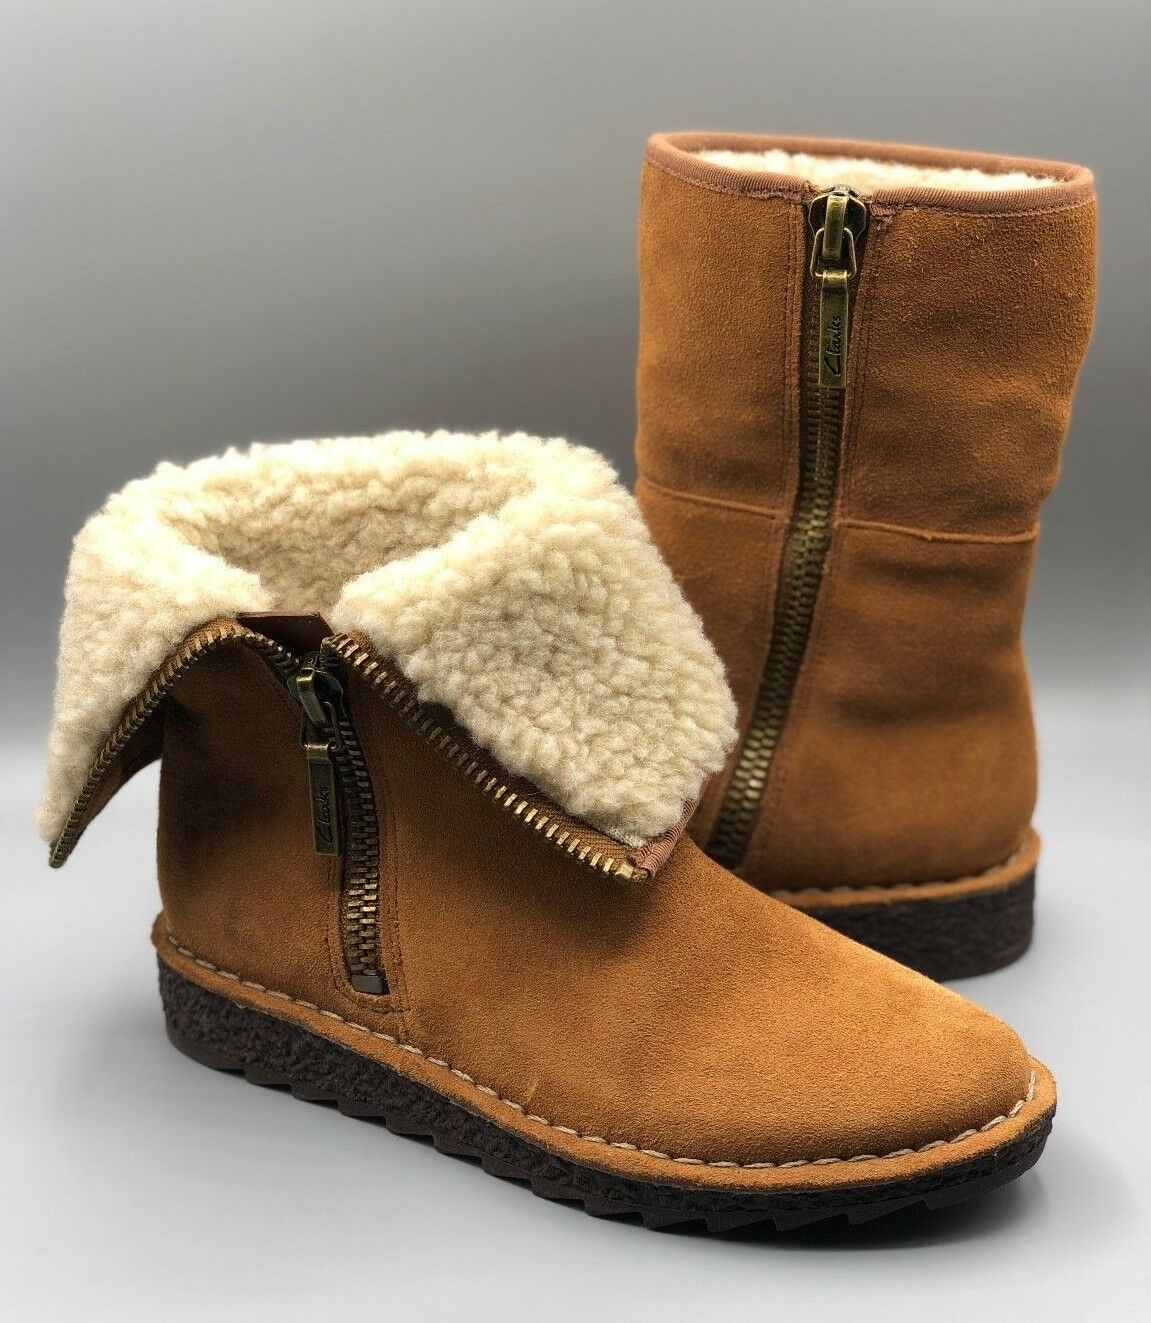 NEW Clarks  Oslo Oslo Oslo Beth  Ladies Tan Suede Winter Warm 2 in 1 Ankle Boots UK 3 D 0b6501